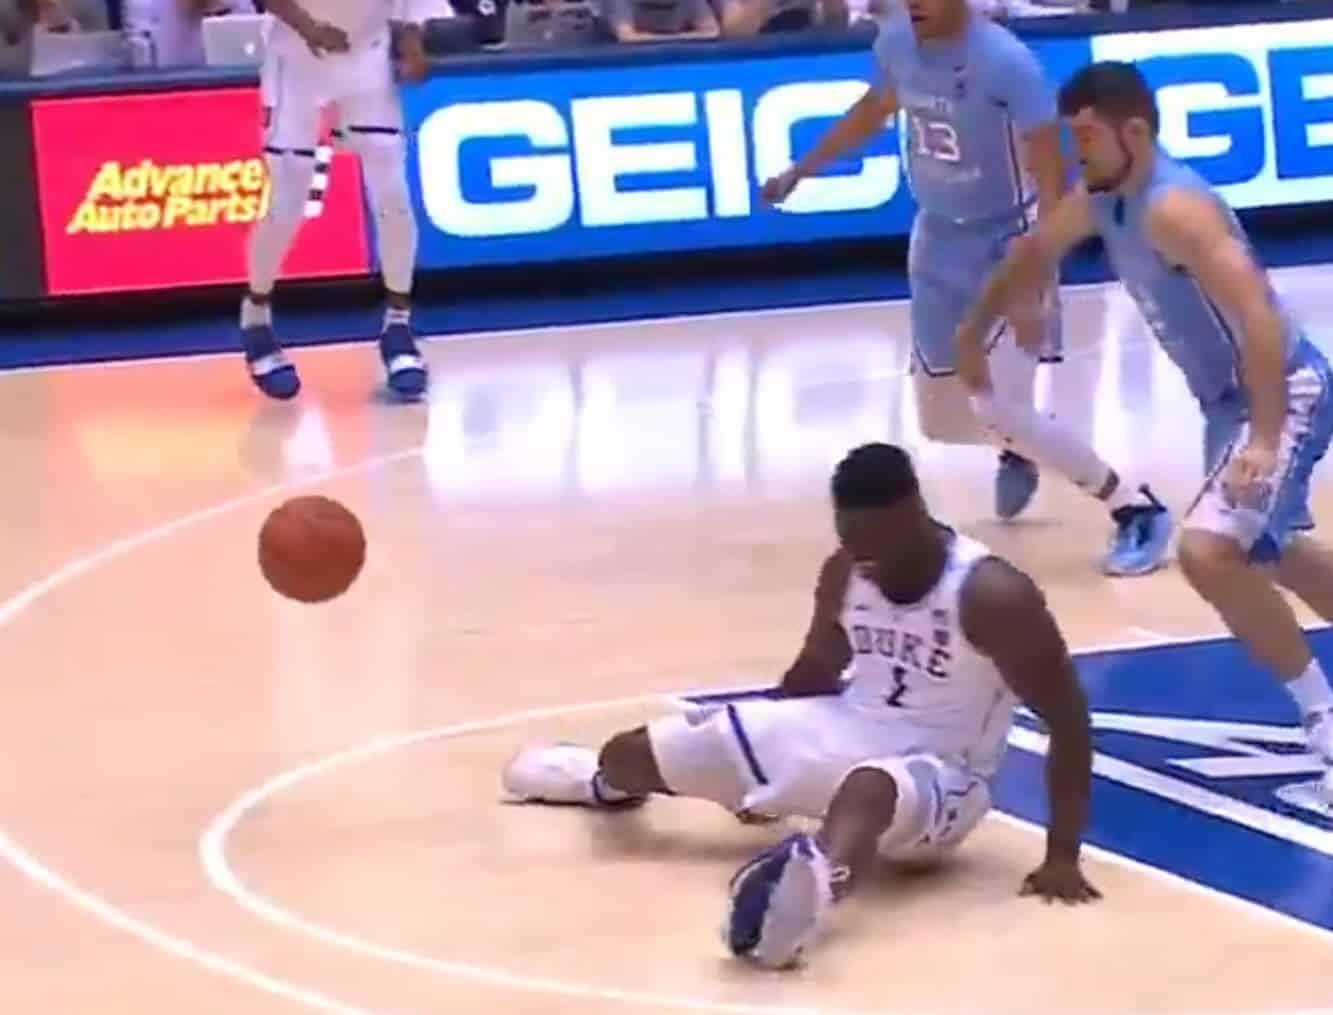 Zion Williamson explose sa Nike, se blesse au genou